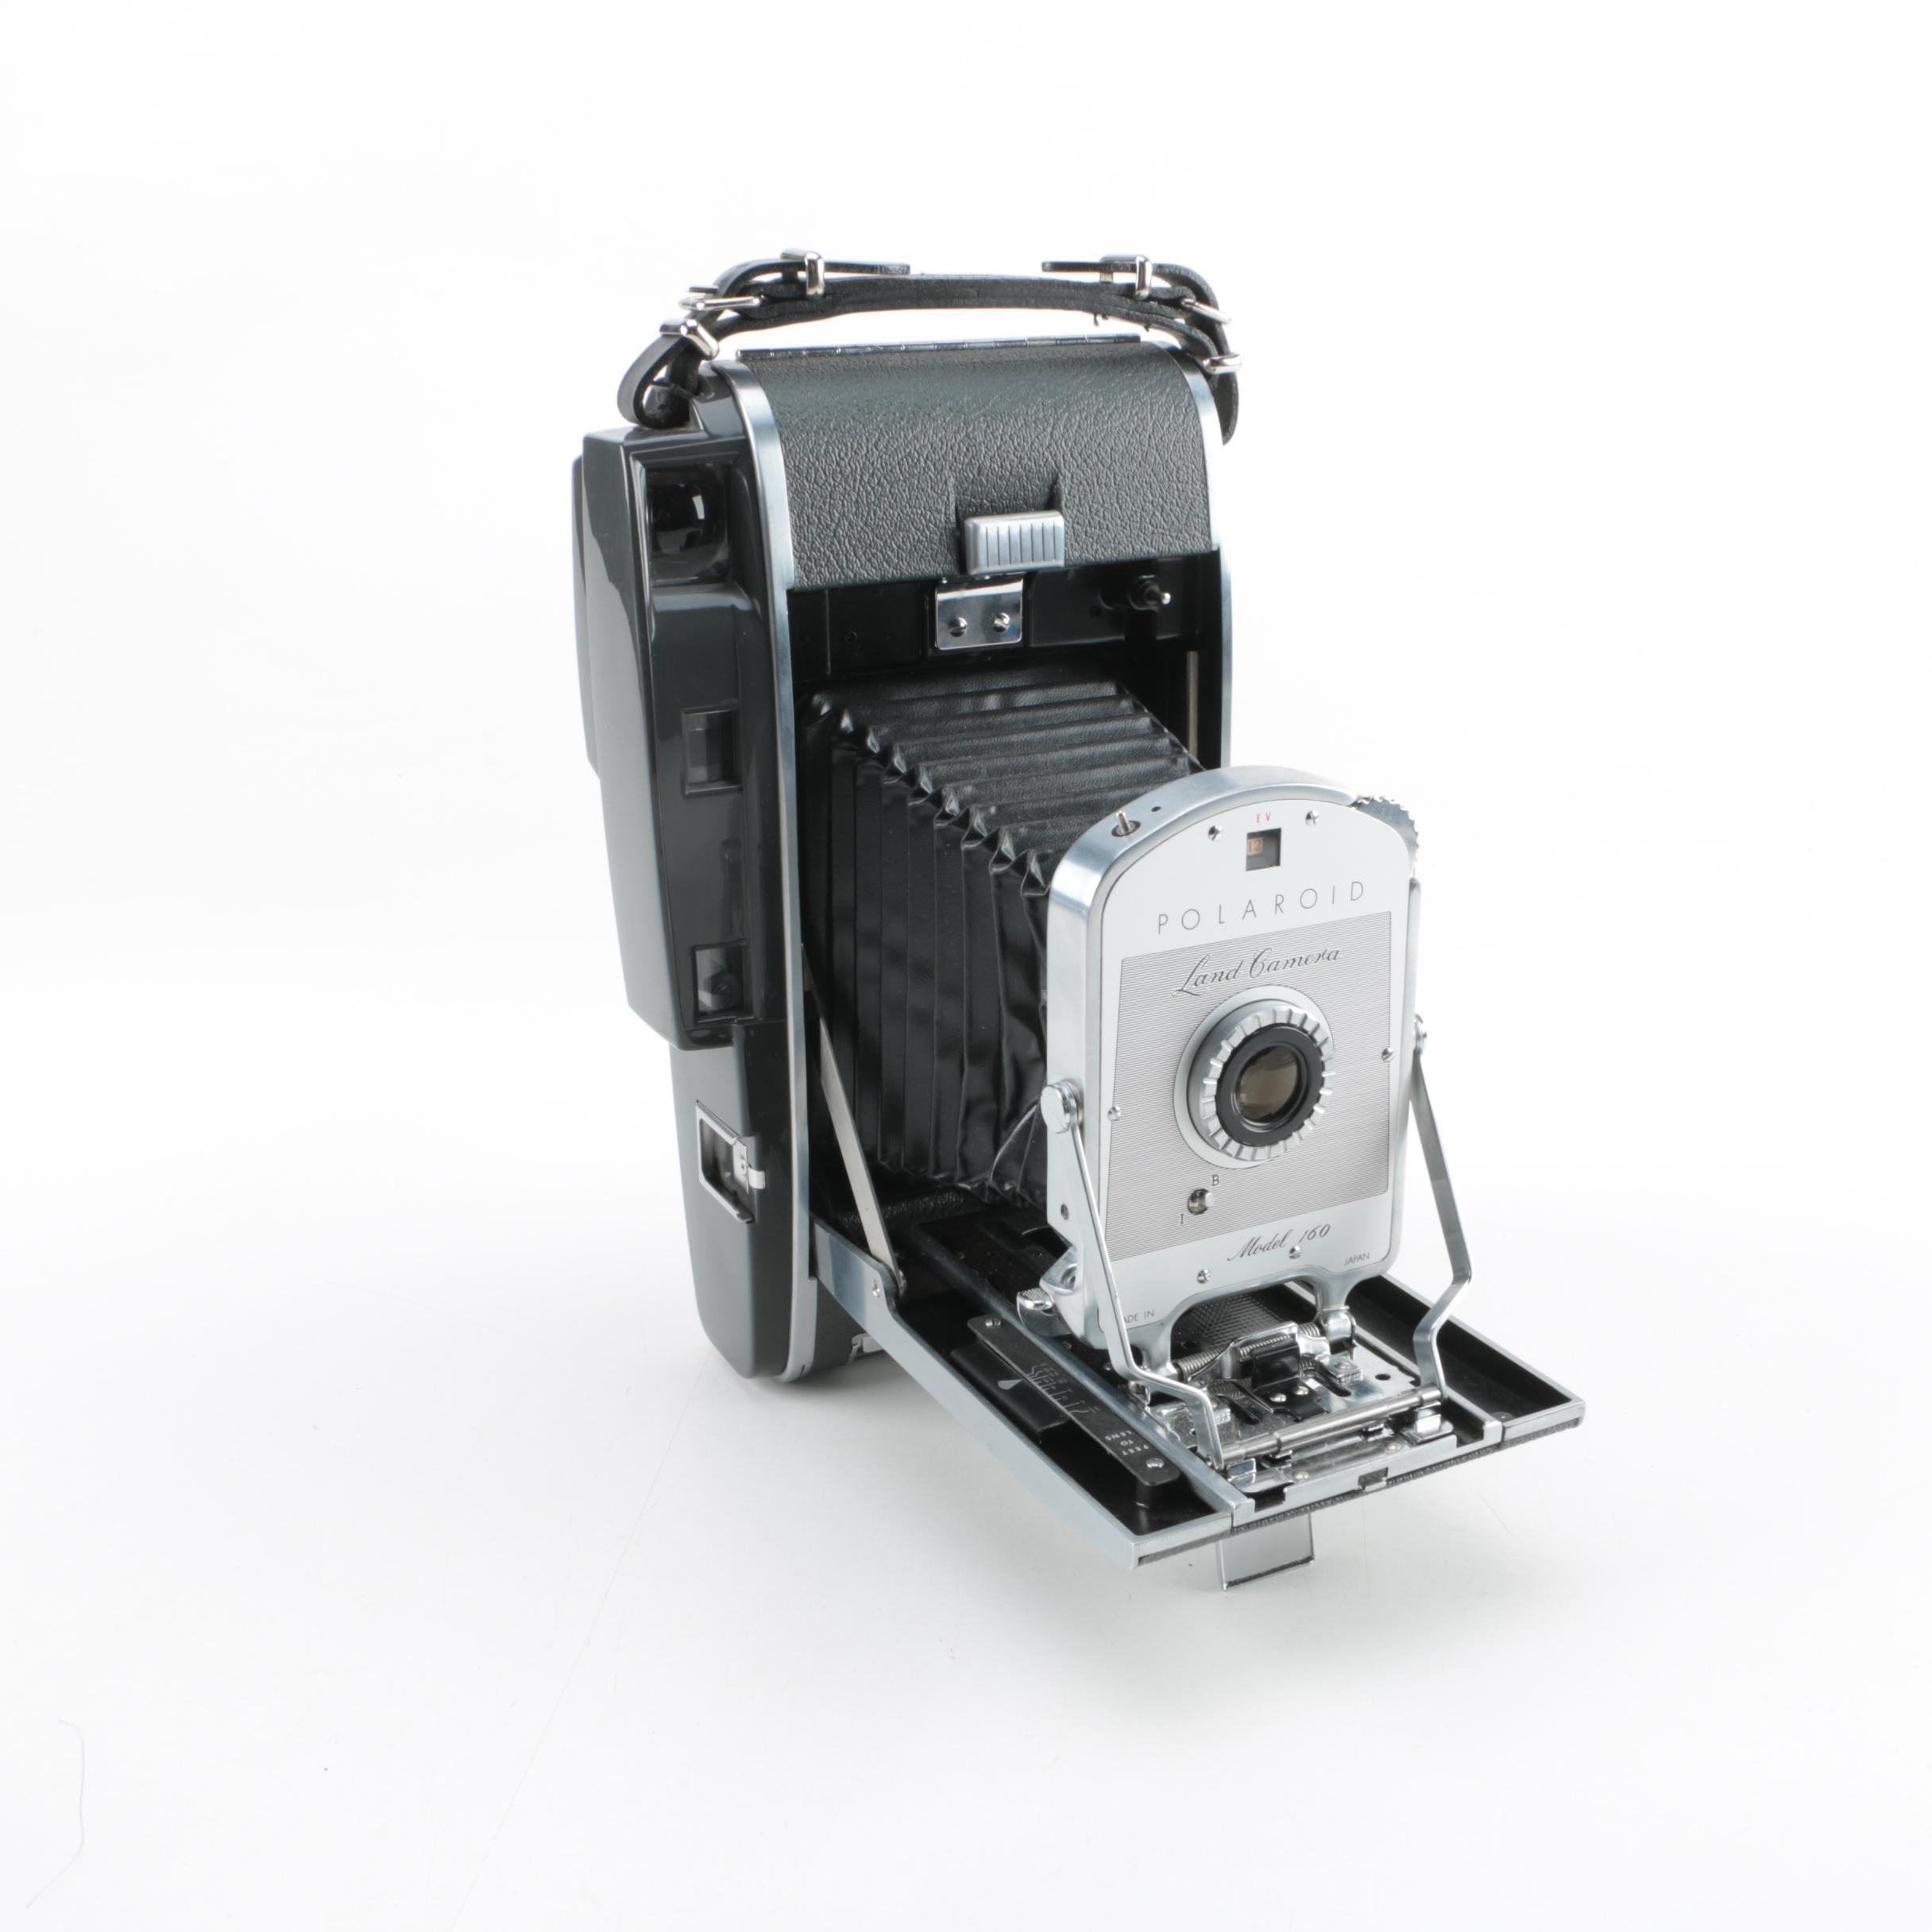 Polaroid Model 160 Land Camera